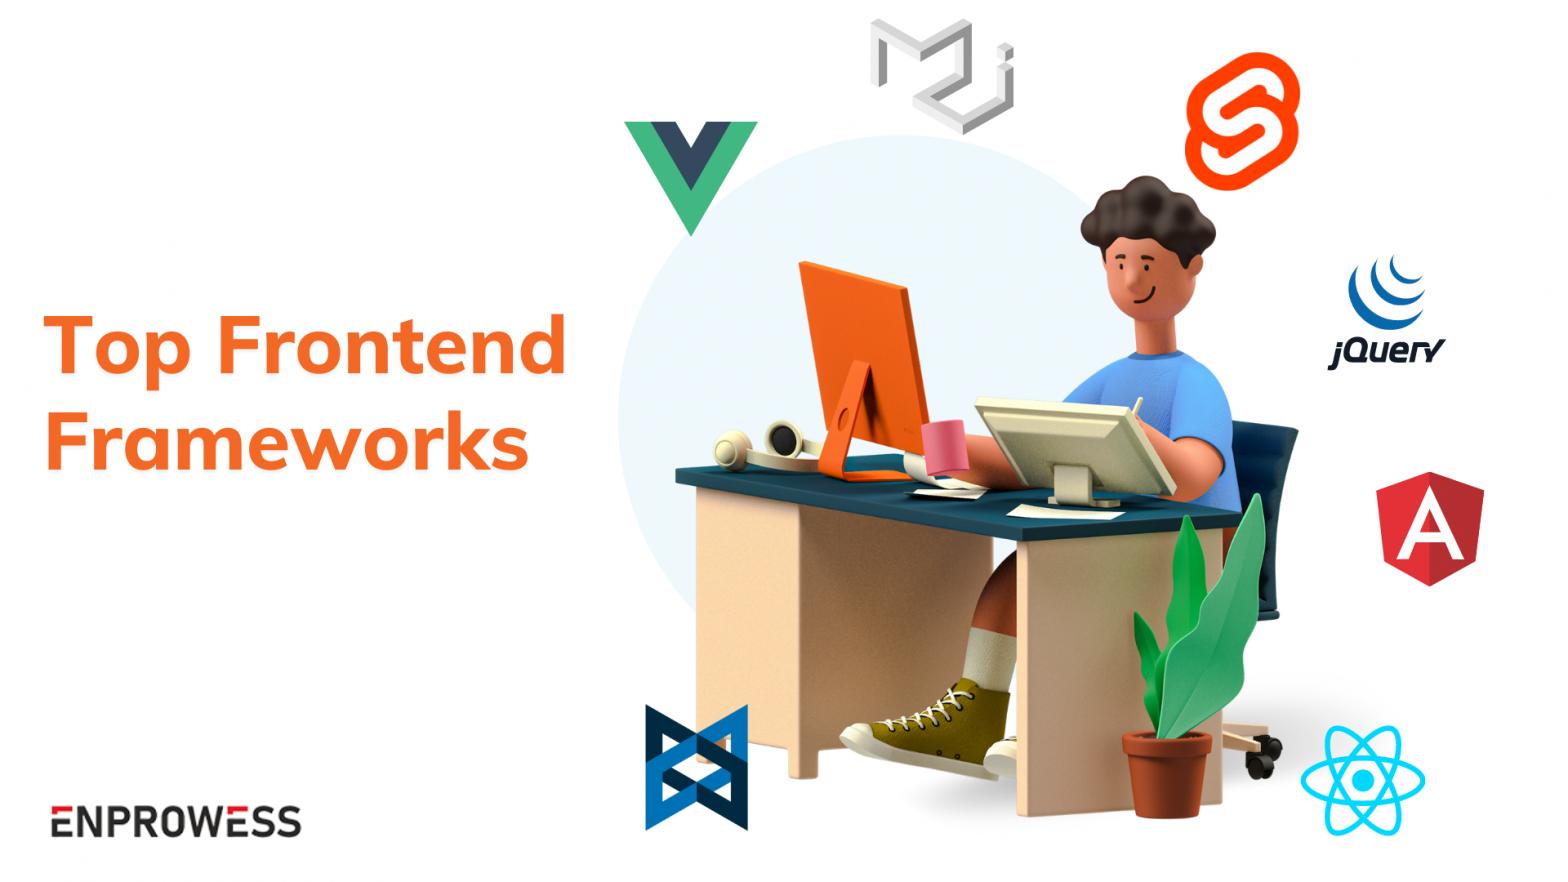 Top Frontend Frameworks - Cover Image